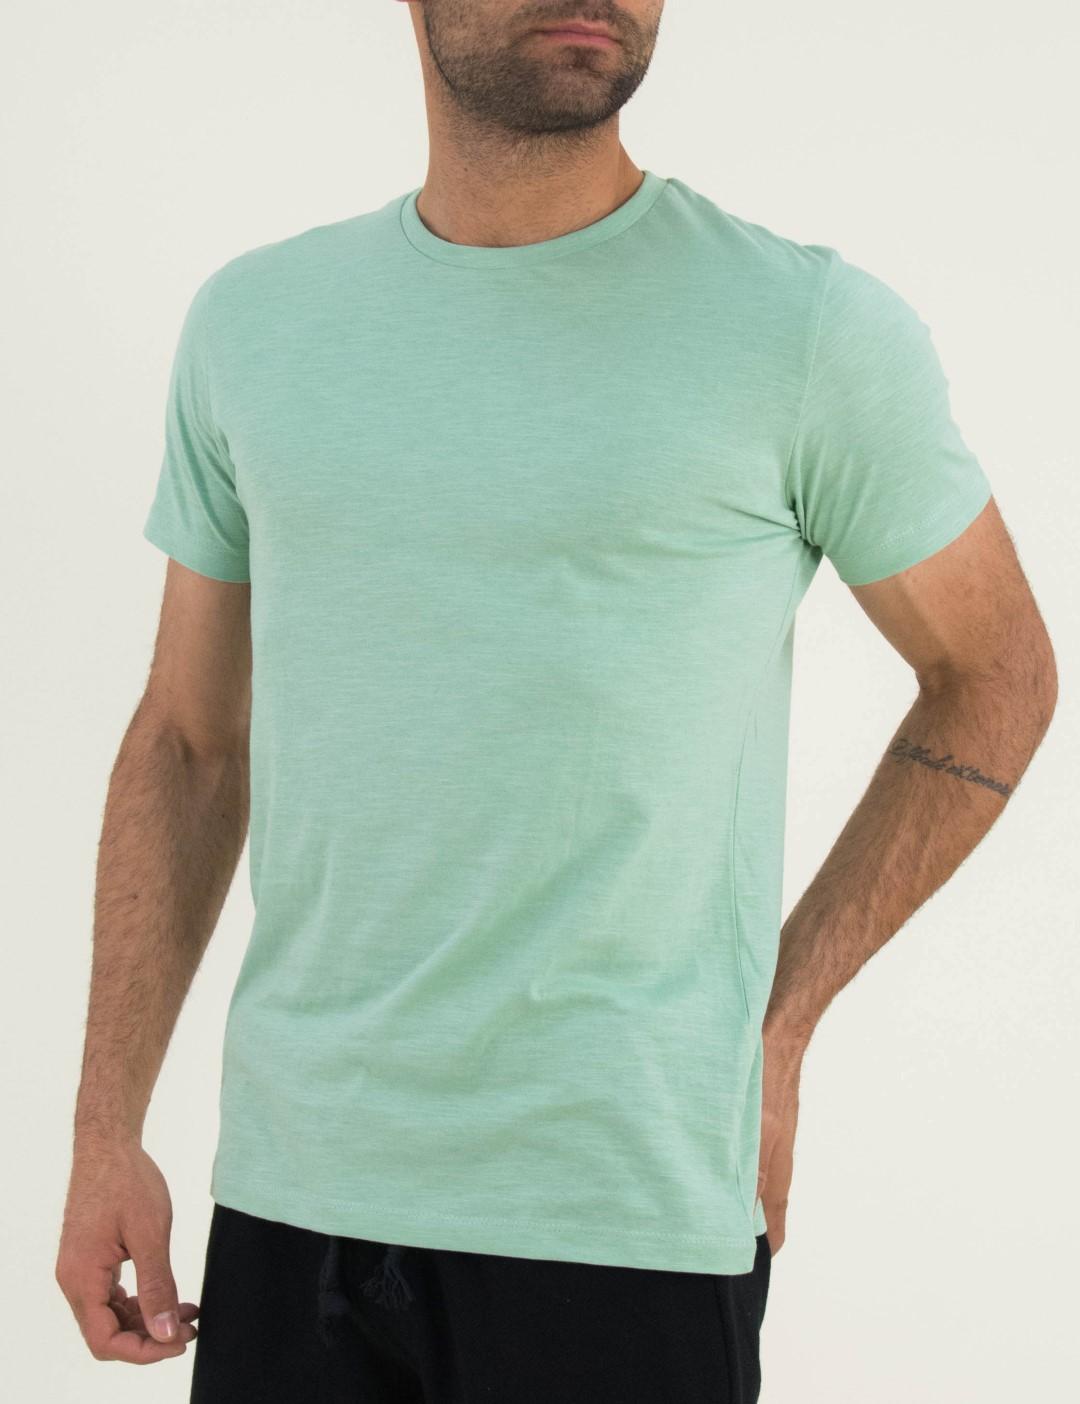 4a541f2adbb Ανδρικές Μπλούζες, Ανδρικά Ρούχα